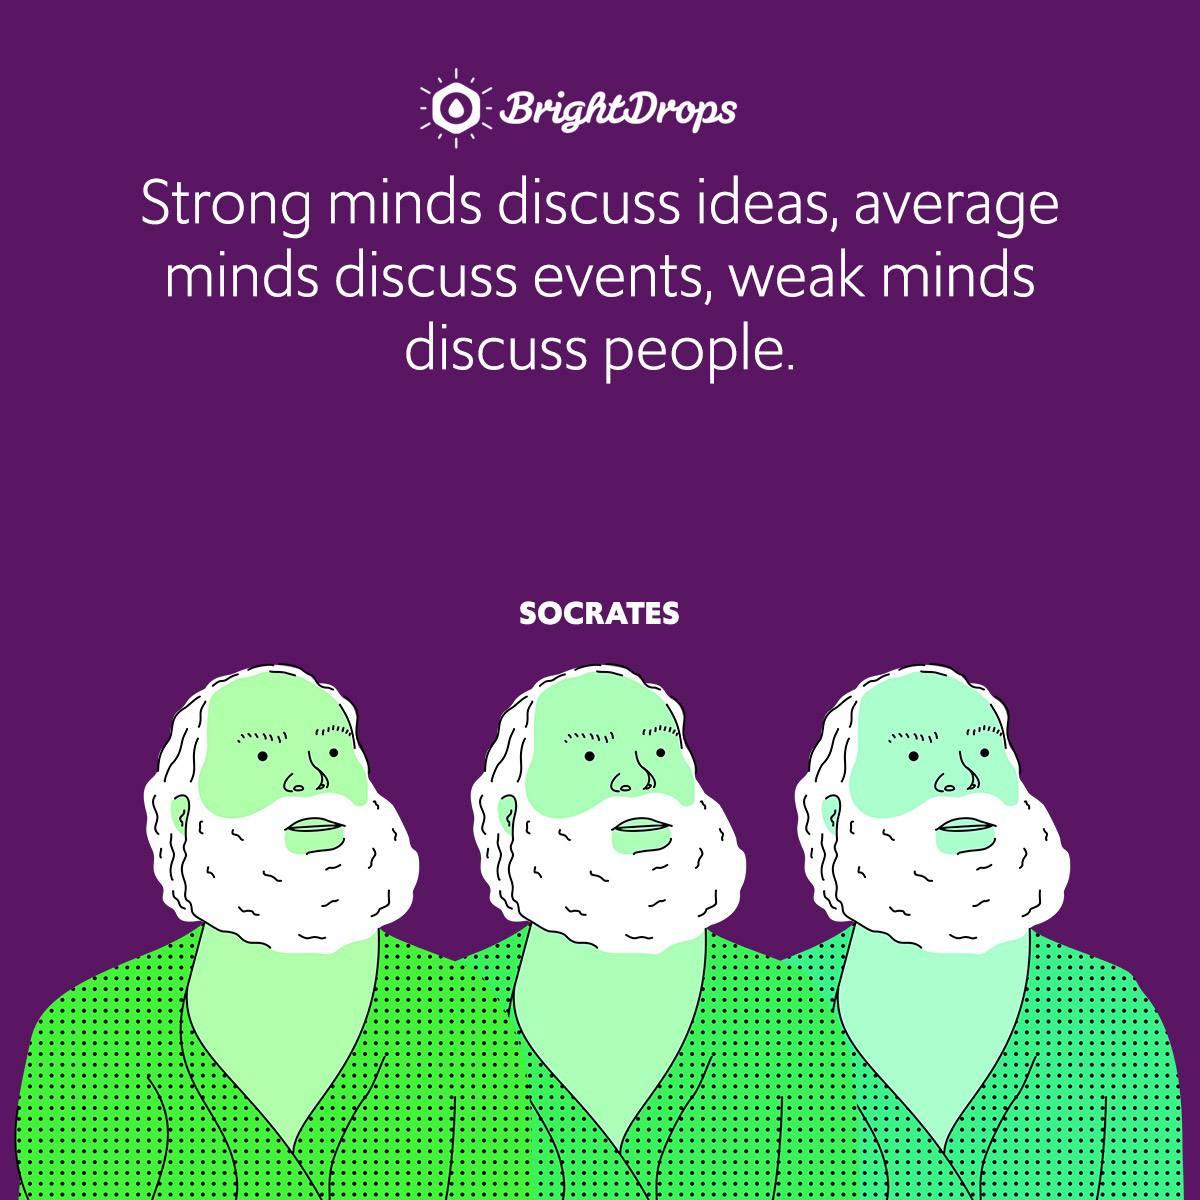 Strong minds discuss ideas, average minds discuss events, weak minds discuss people.